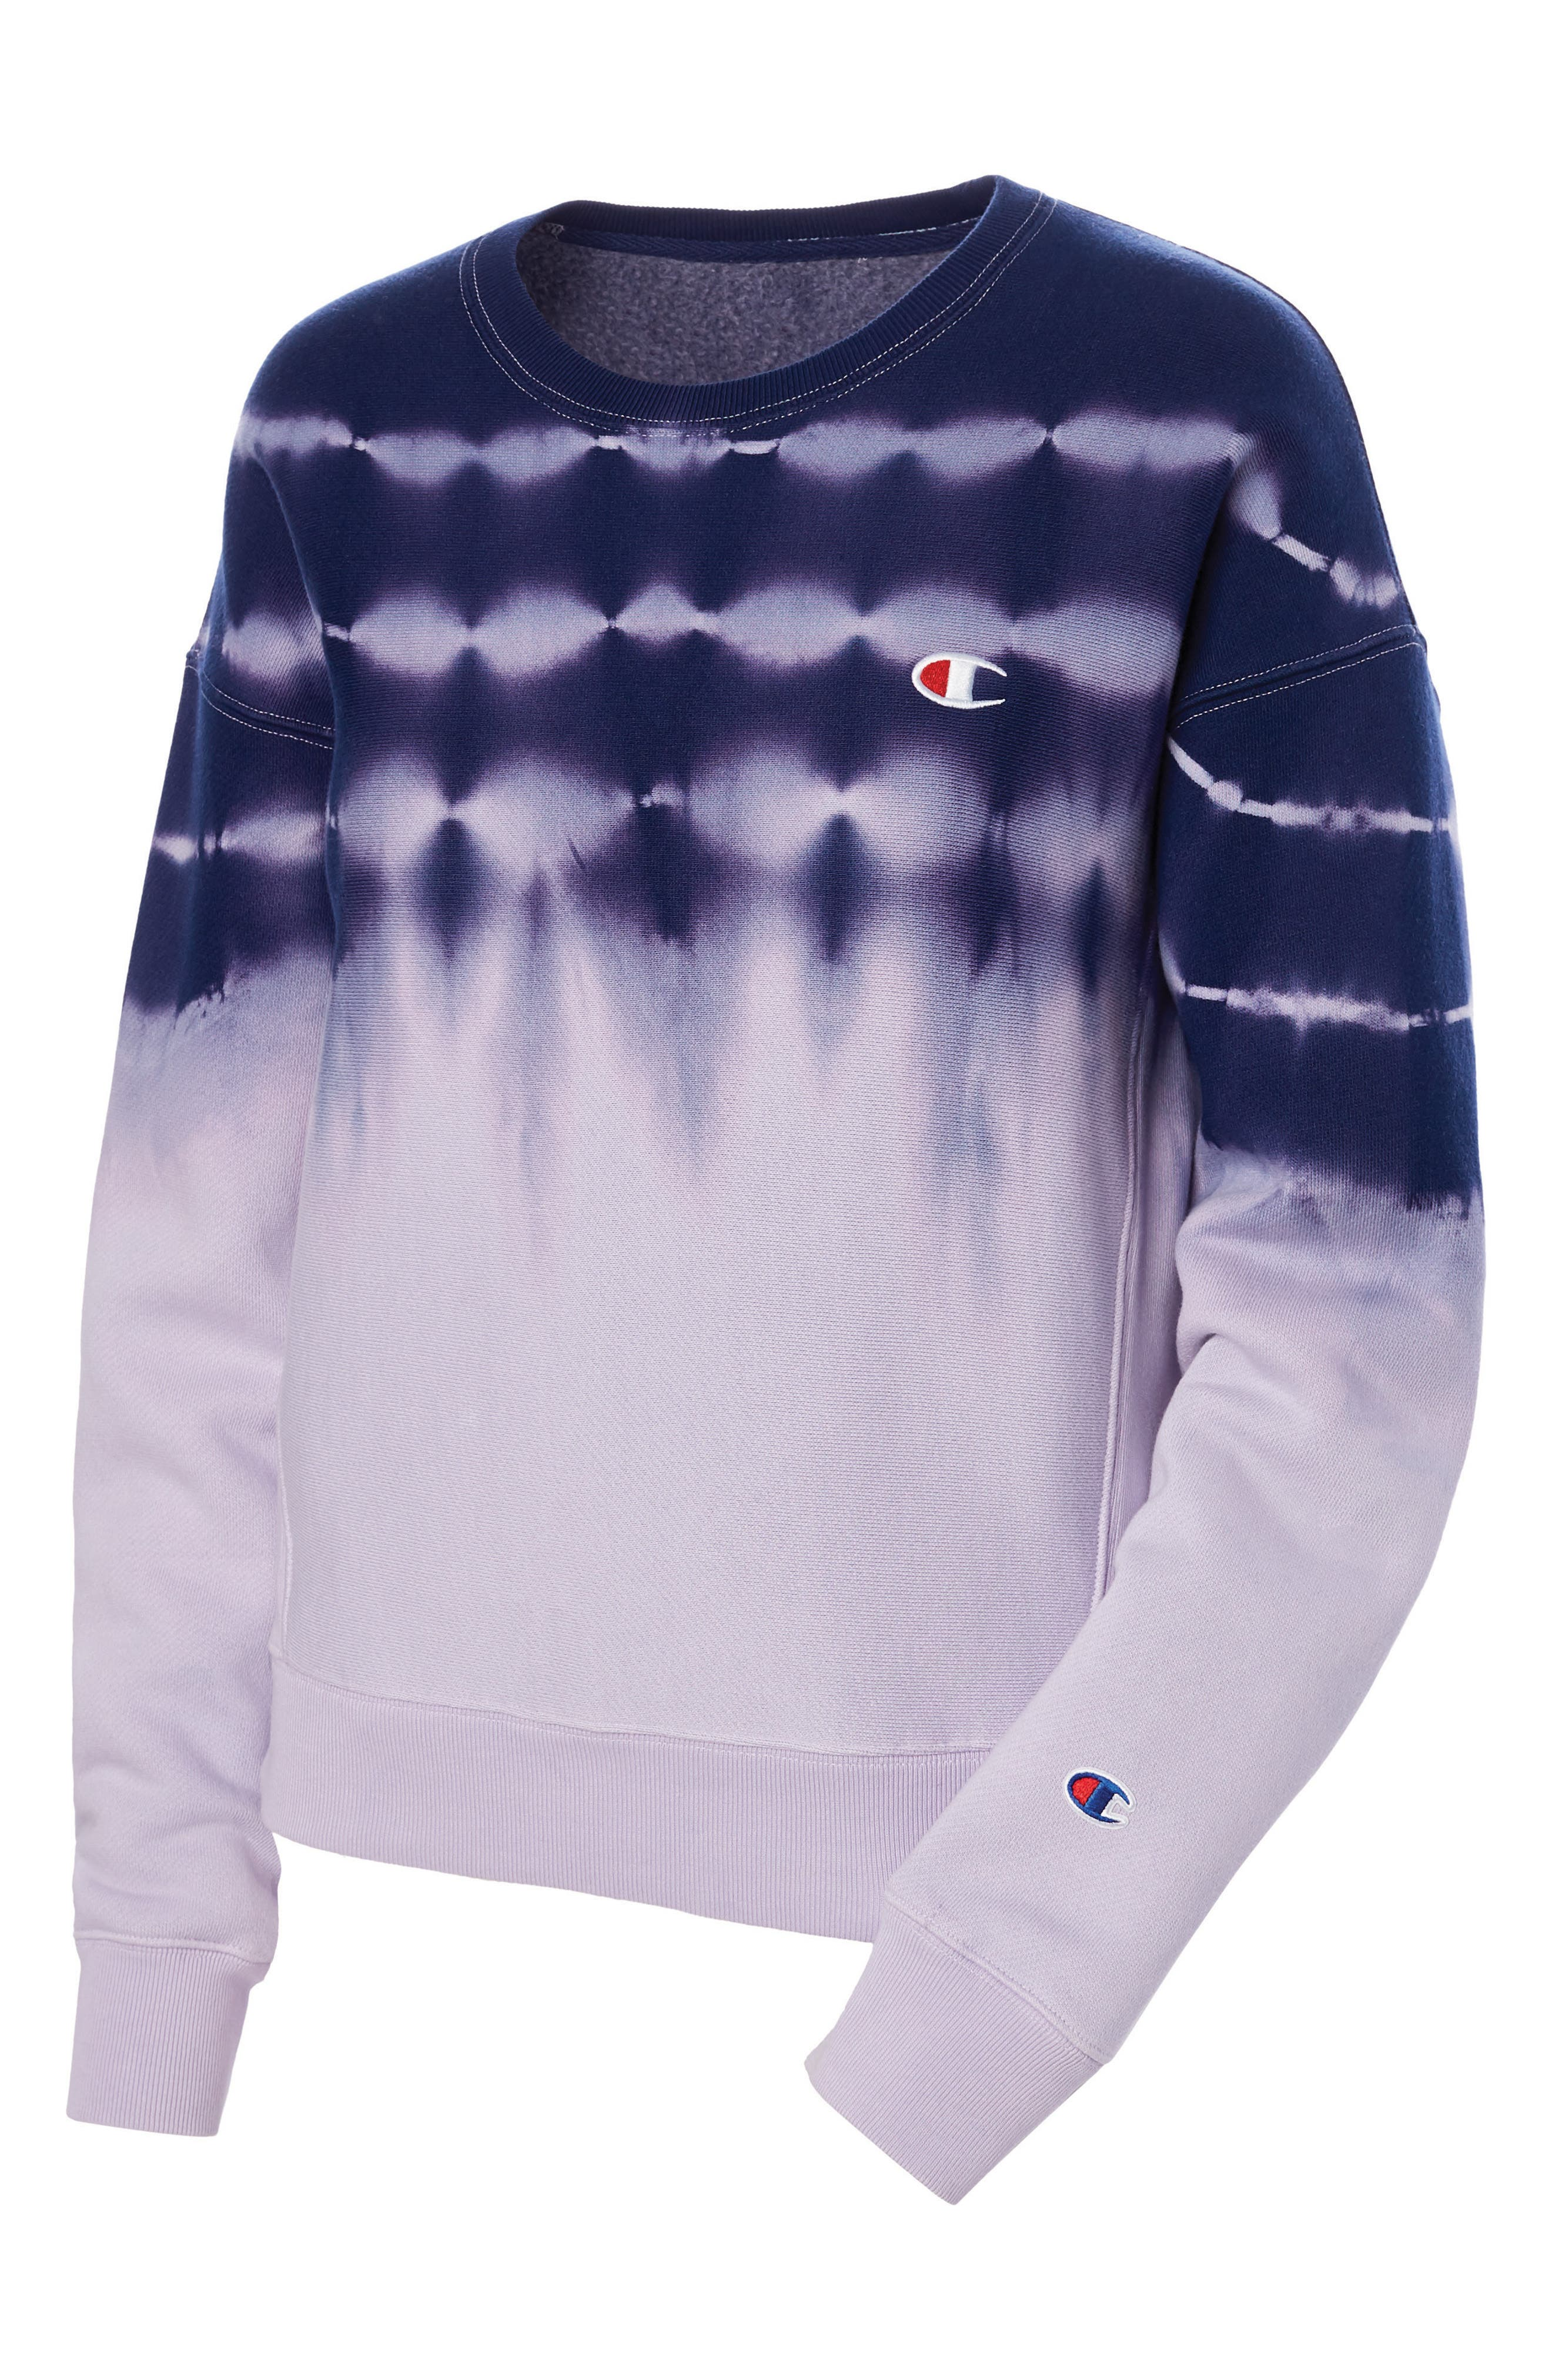 CHAMPION, Streak Dye Sweatshirt, Alternate thumbnail 3, color, PALE VIOLET ROSE